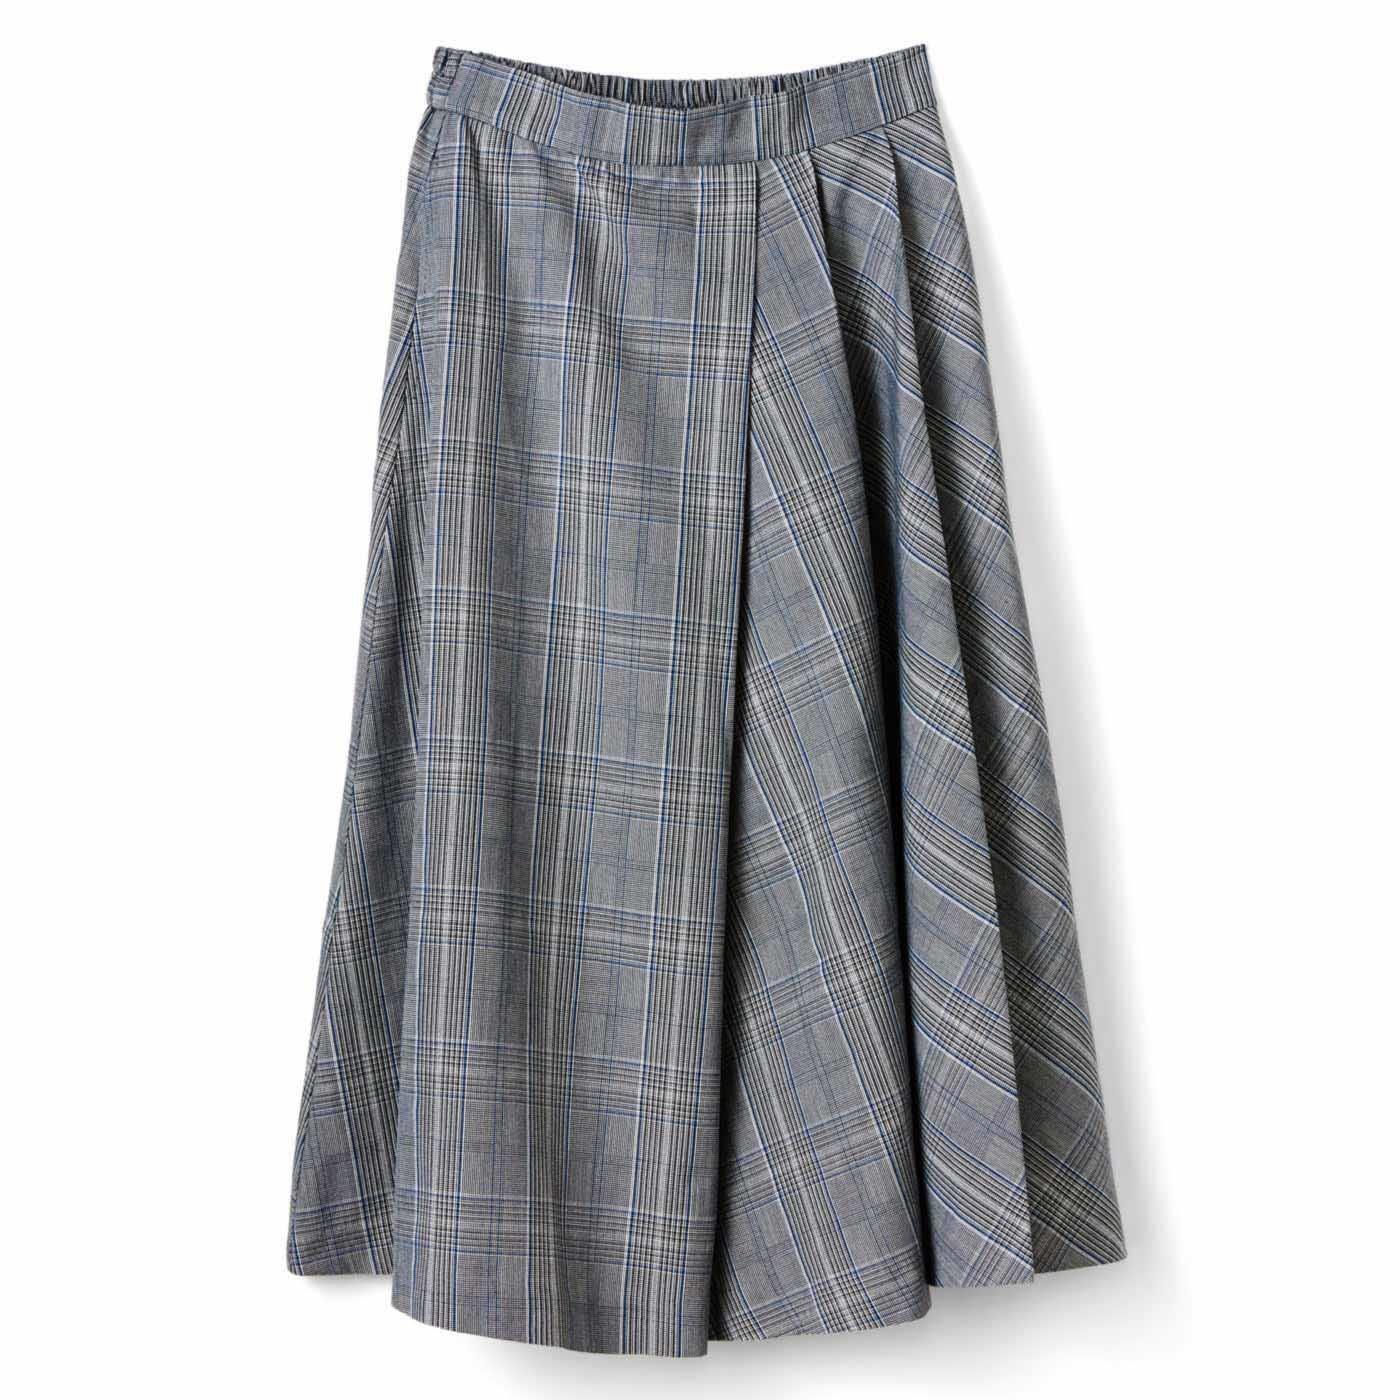 IEDIT[イディット] タックフレアーでチェックが美しく揺れ動く大人の着映えスカート〈グレー〉